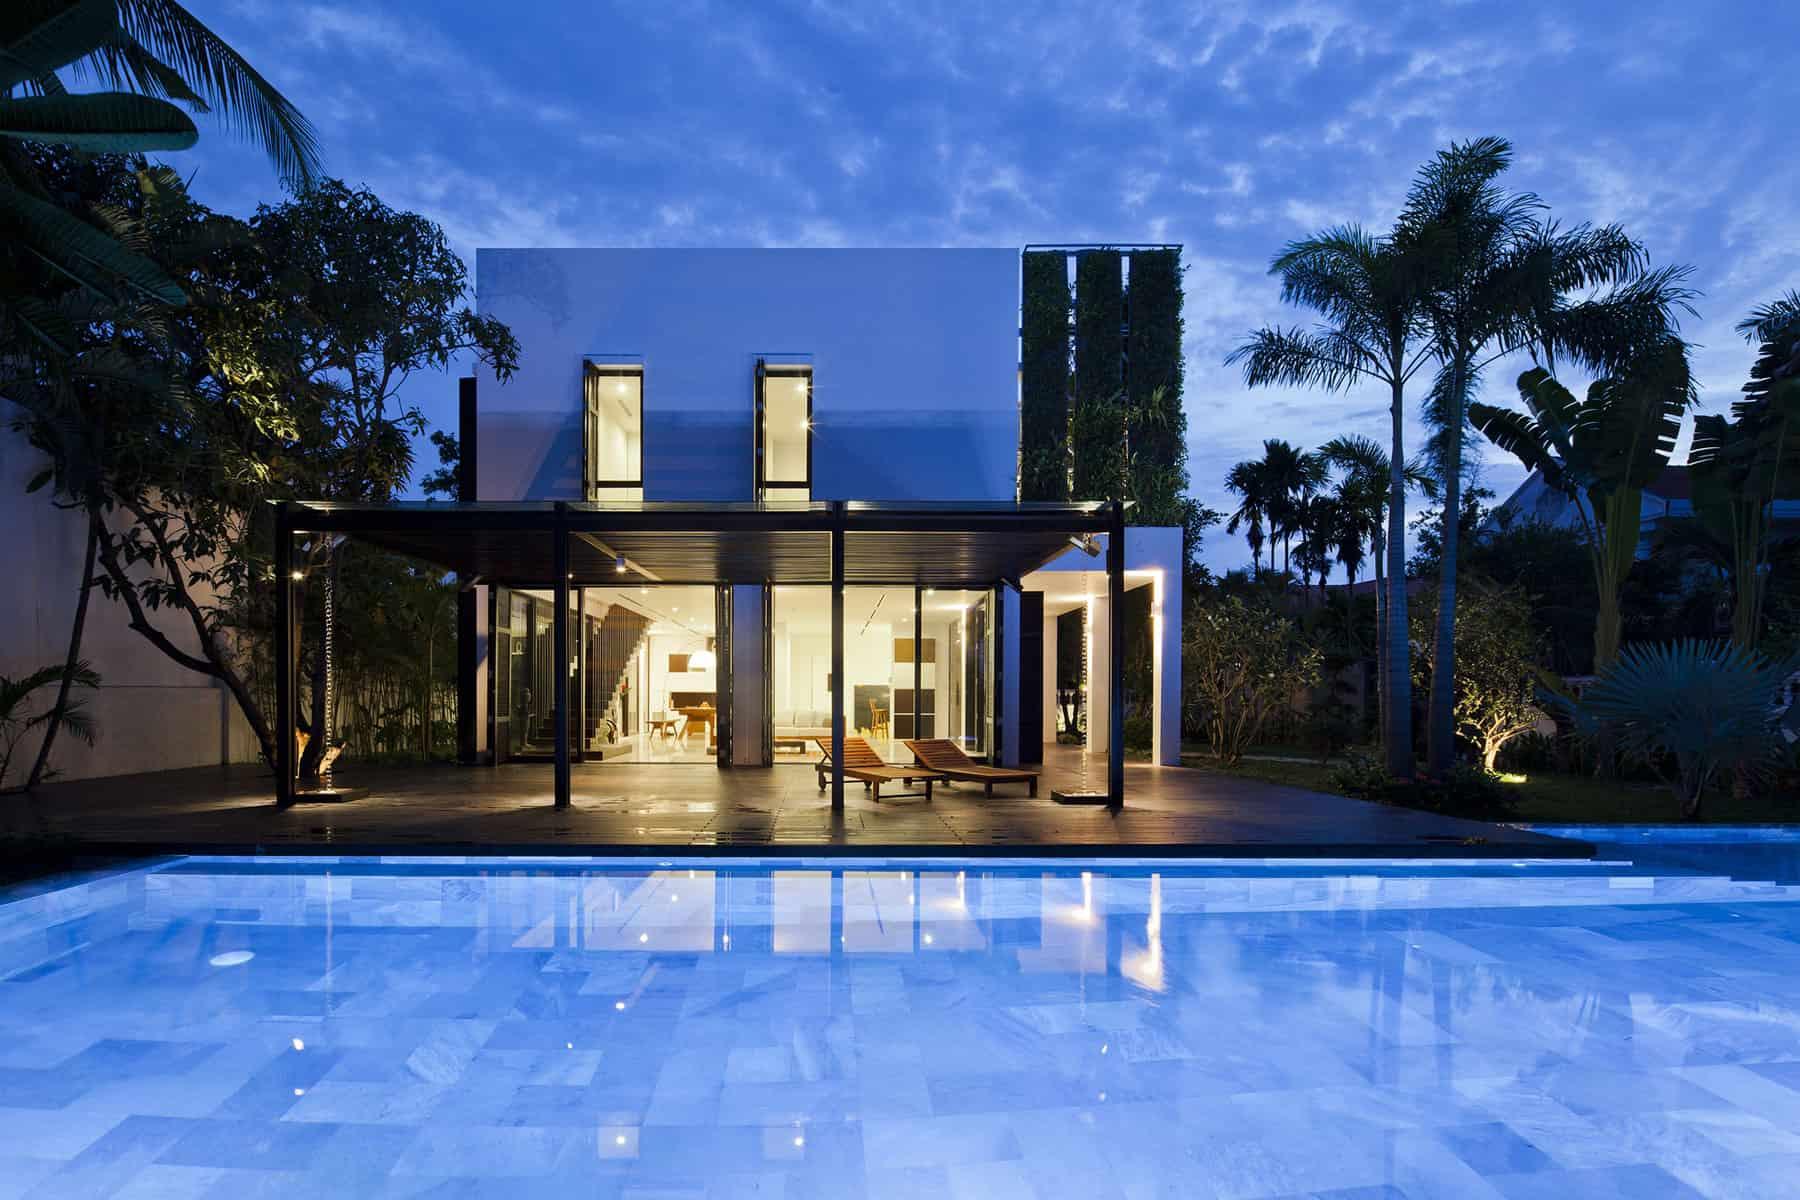 Private Villa Renovation by MM++ architects